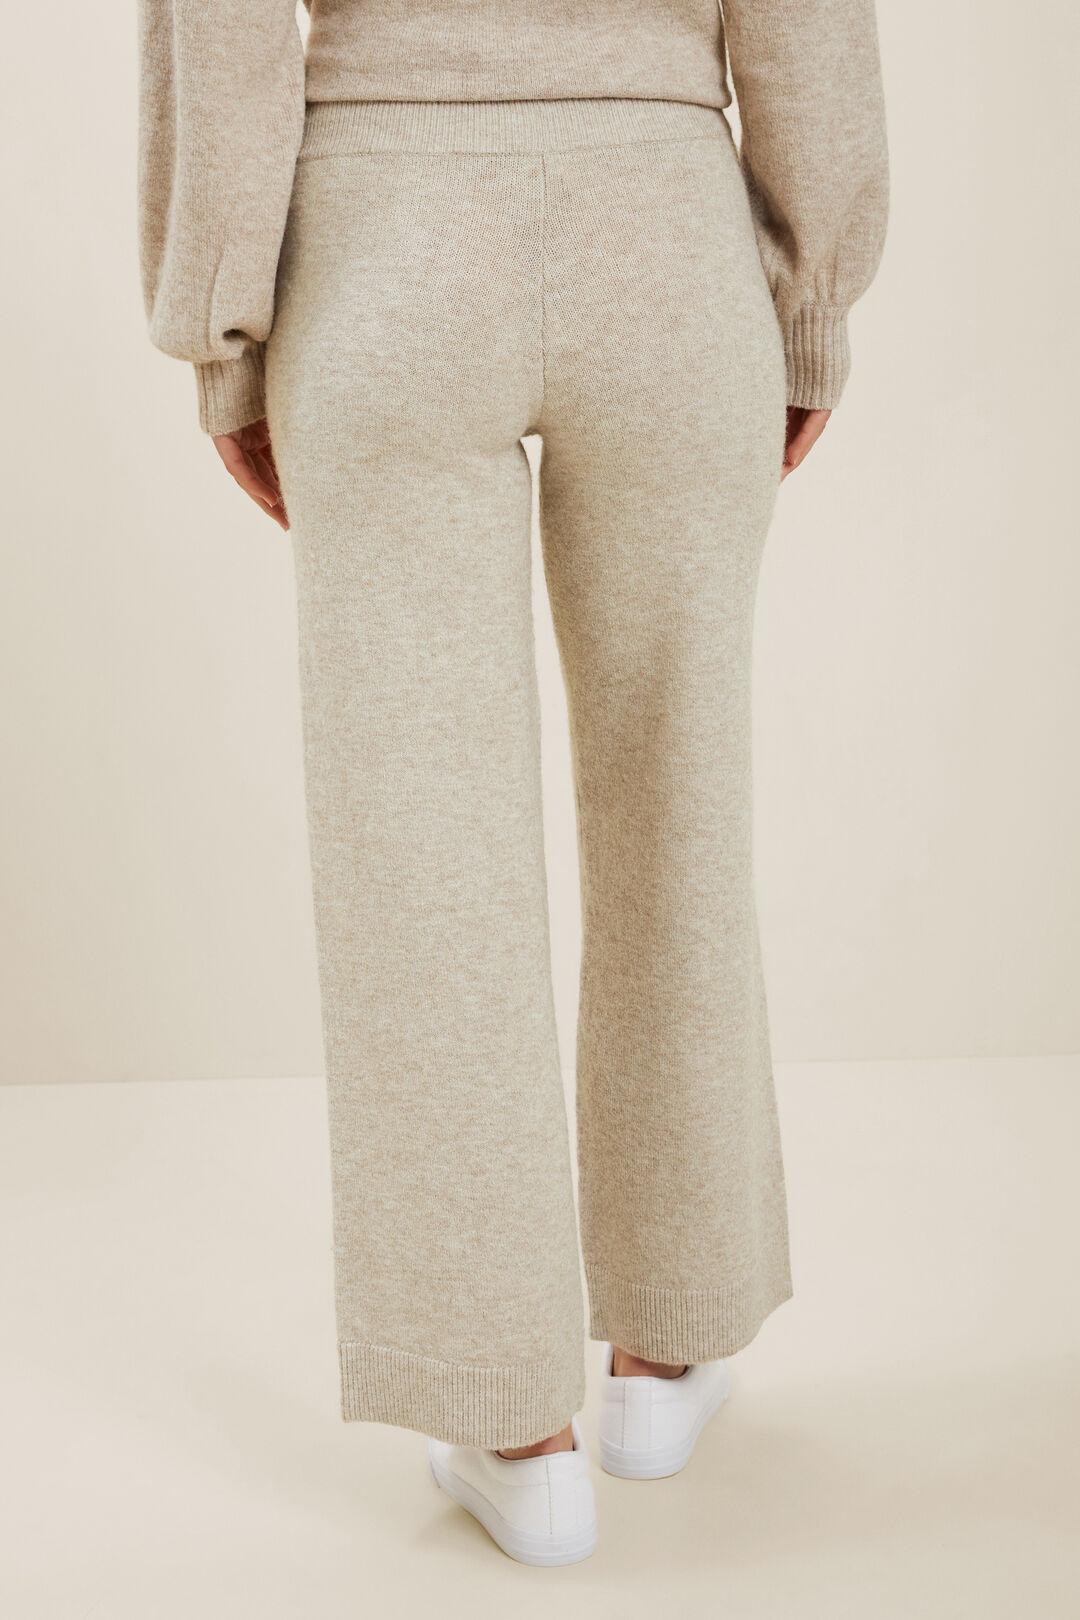 Tie Front Knit Pant  NEUTRAL BLUSH MARLE  hi-res